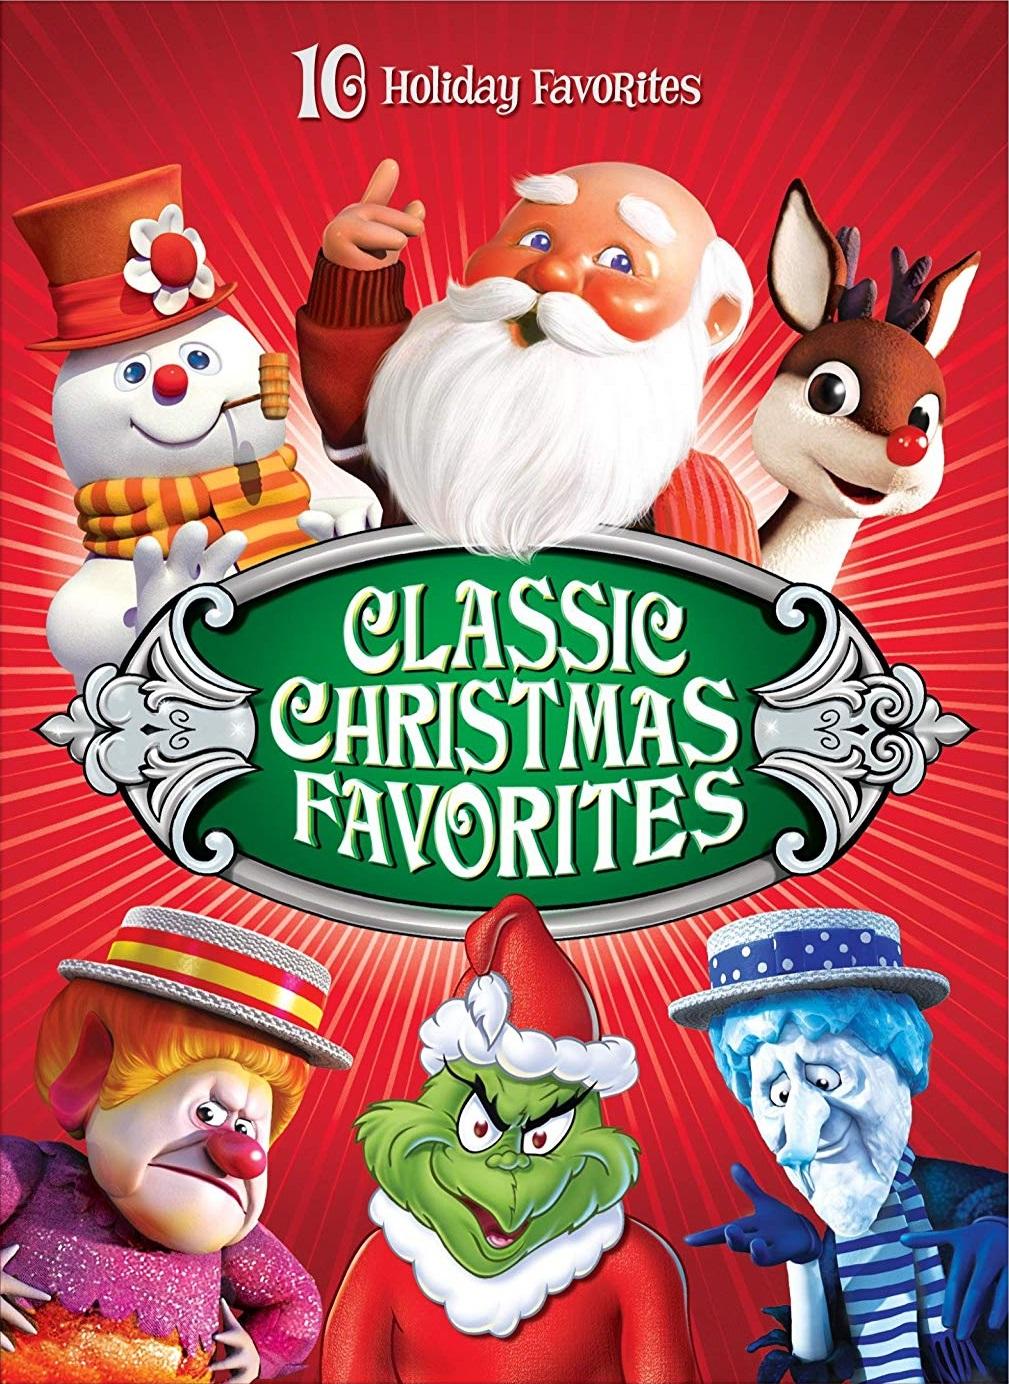 File:Classicchristmasfavorites.jpg